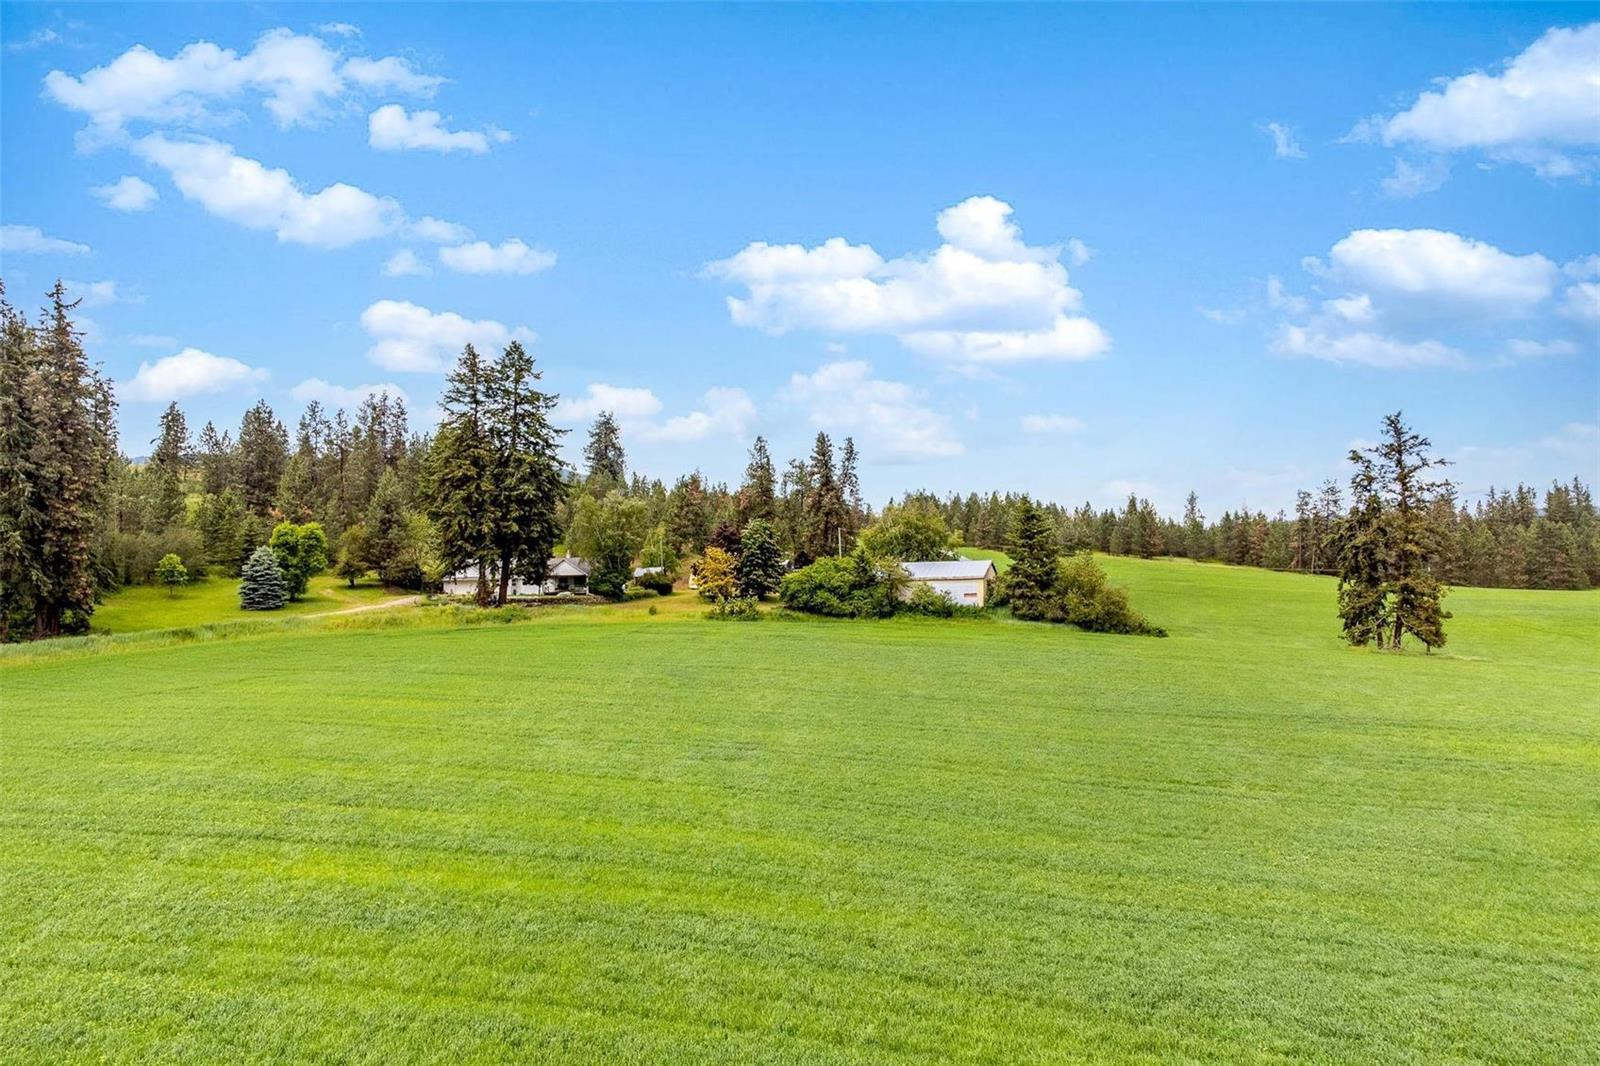 4602 Schubert Road,, Armstrong, British Columbia  V0E 1B4 - Photo 1 - 10232683